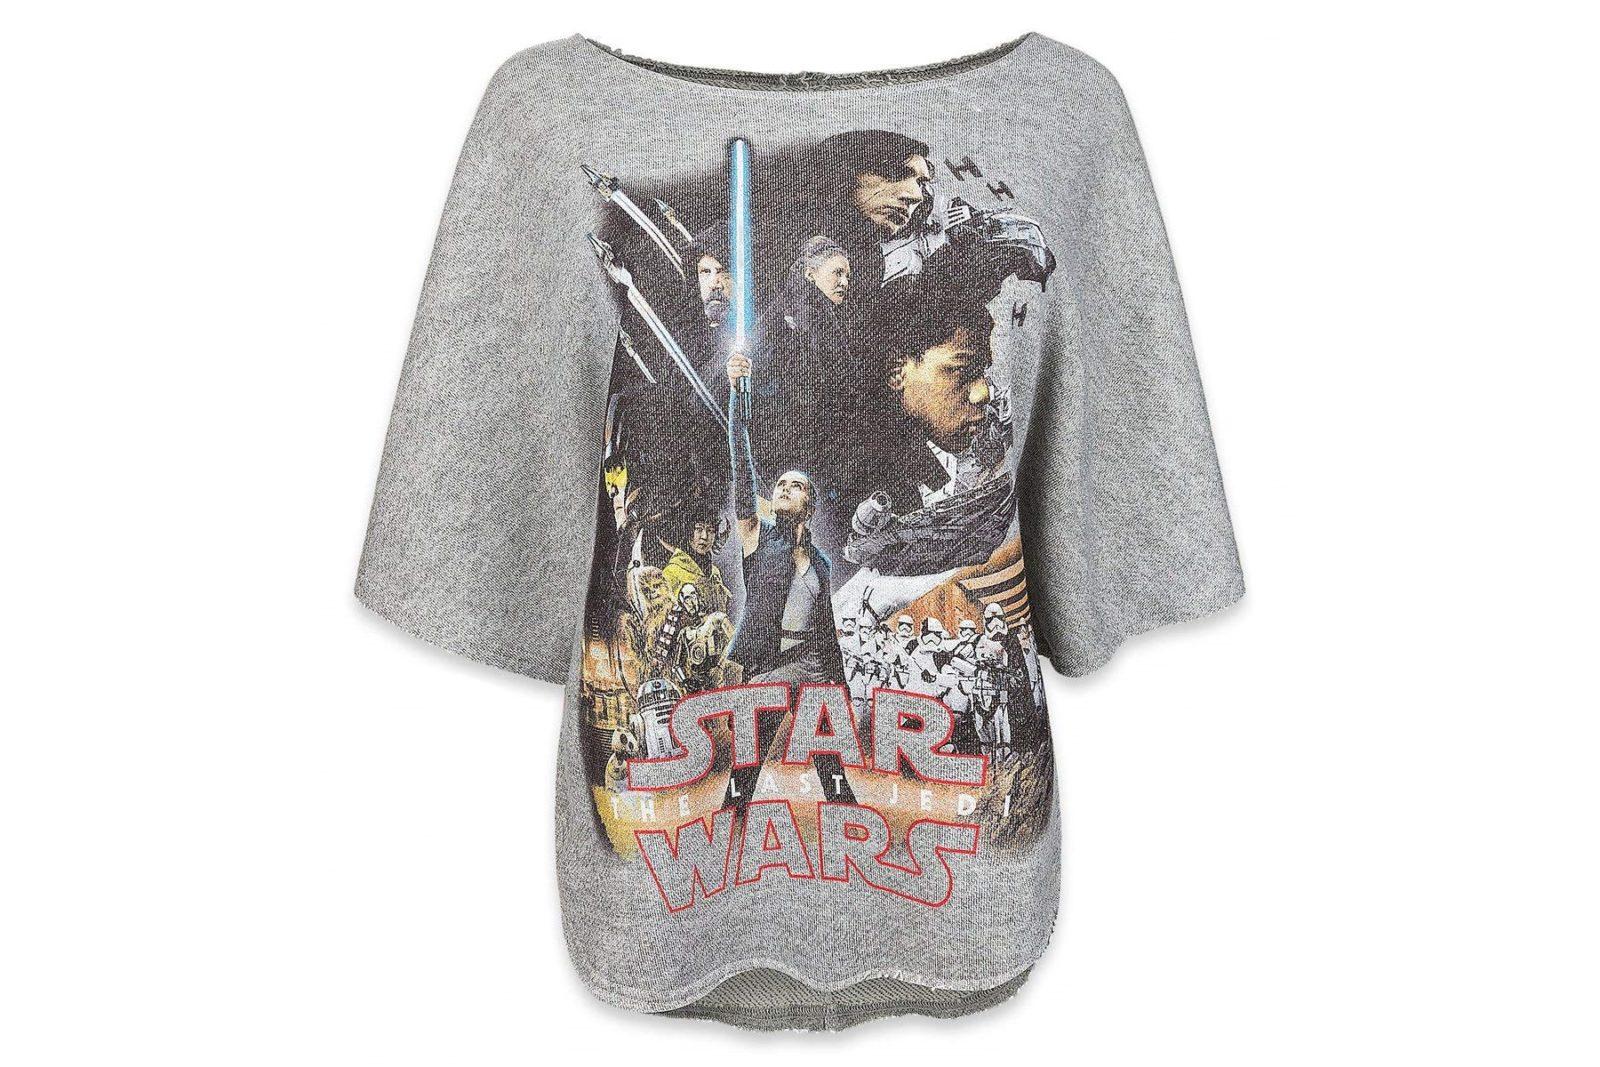 Women's The Last Jedi Sweatshirt on Amazon